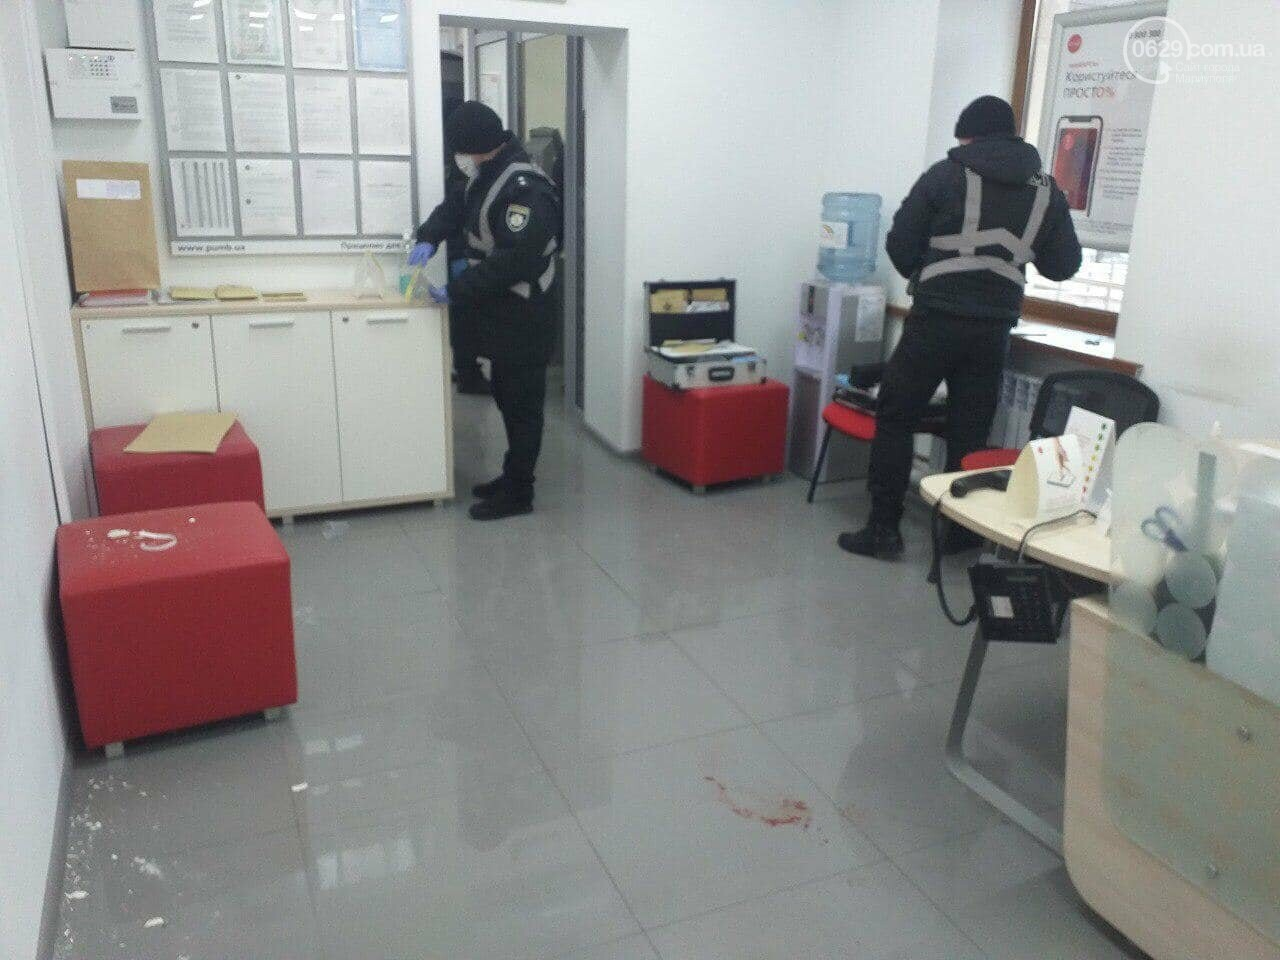 Захват заложников! В Мариуполе мужчина угрожал взорвать сотрудников банка, - Дополнено, ФОТО, ВИДЕО, фото-4